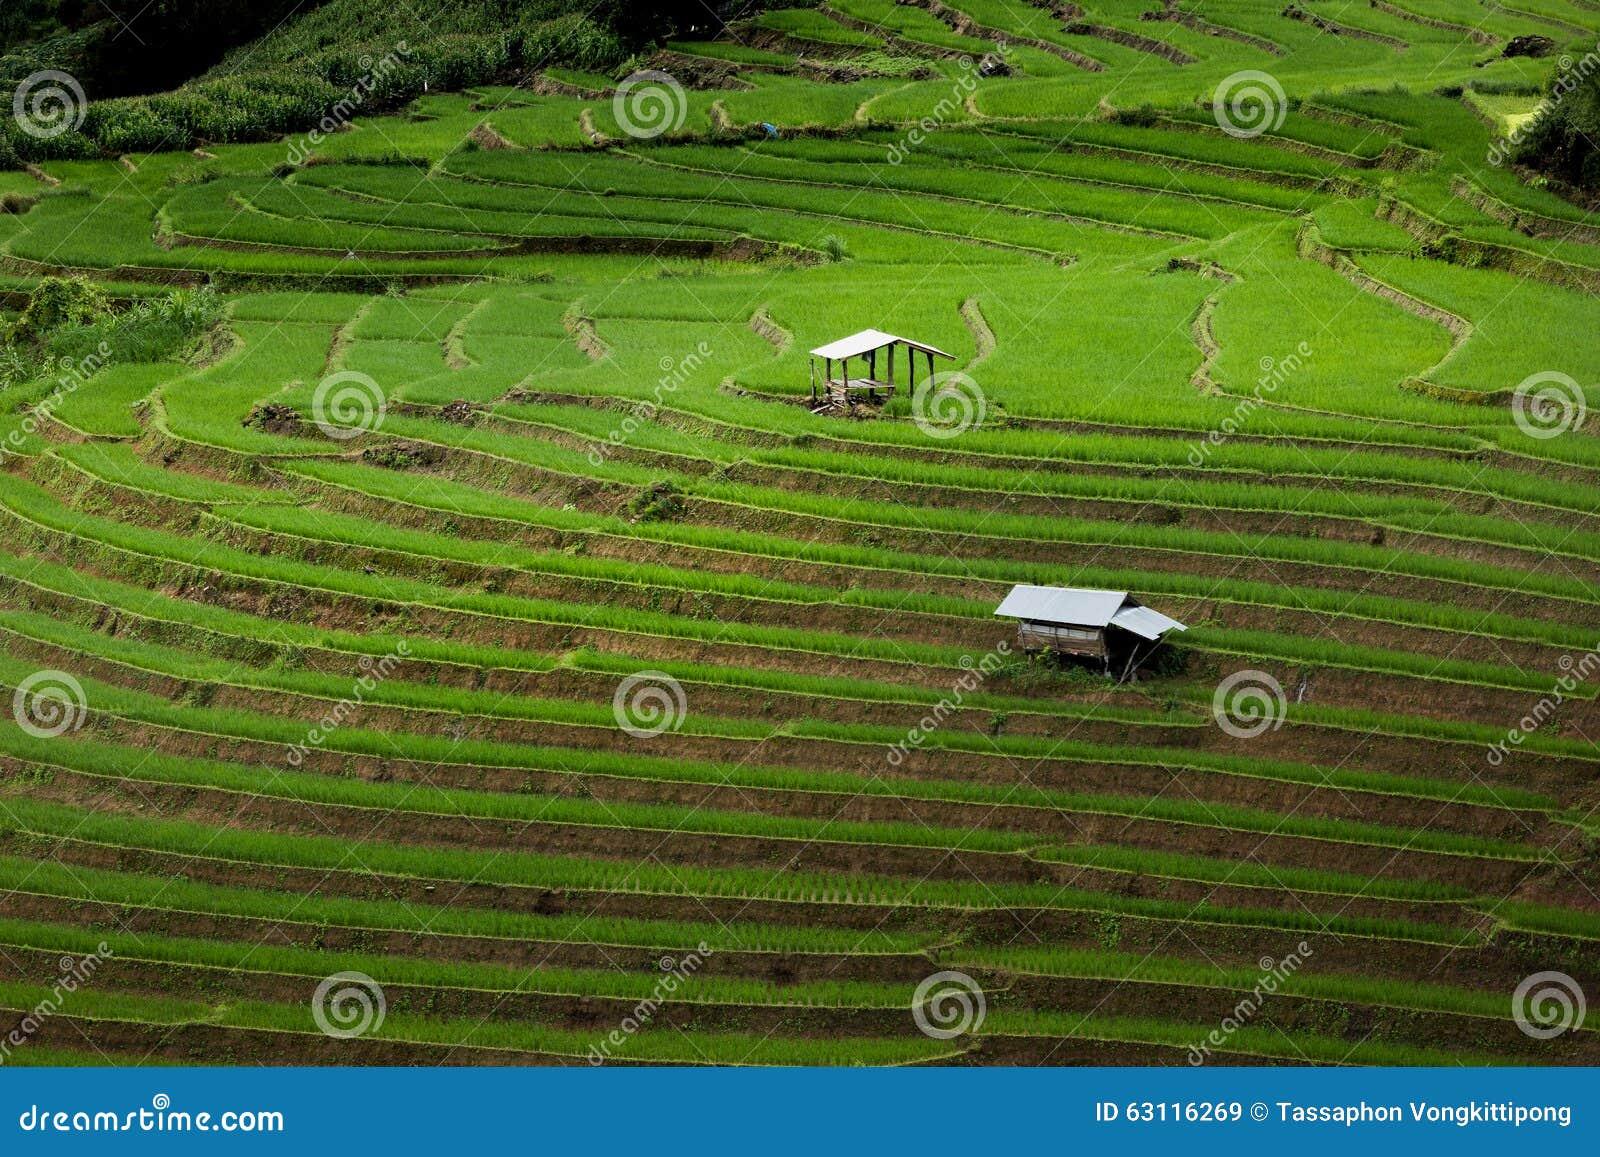 Rice Farming & Processing Business Plan In Nigeria Feasibility Studies PDF